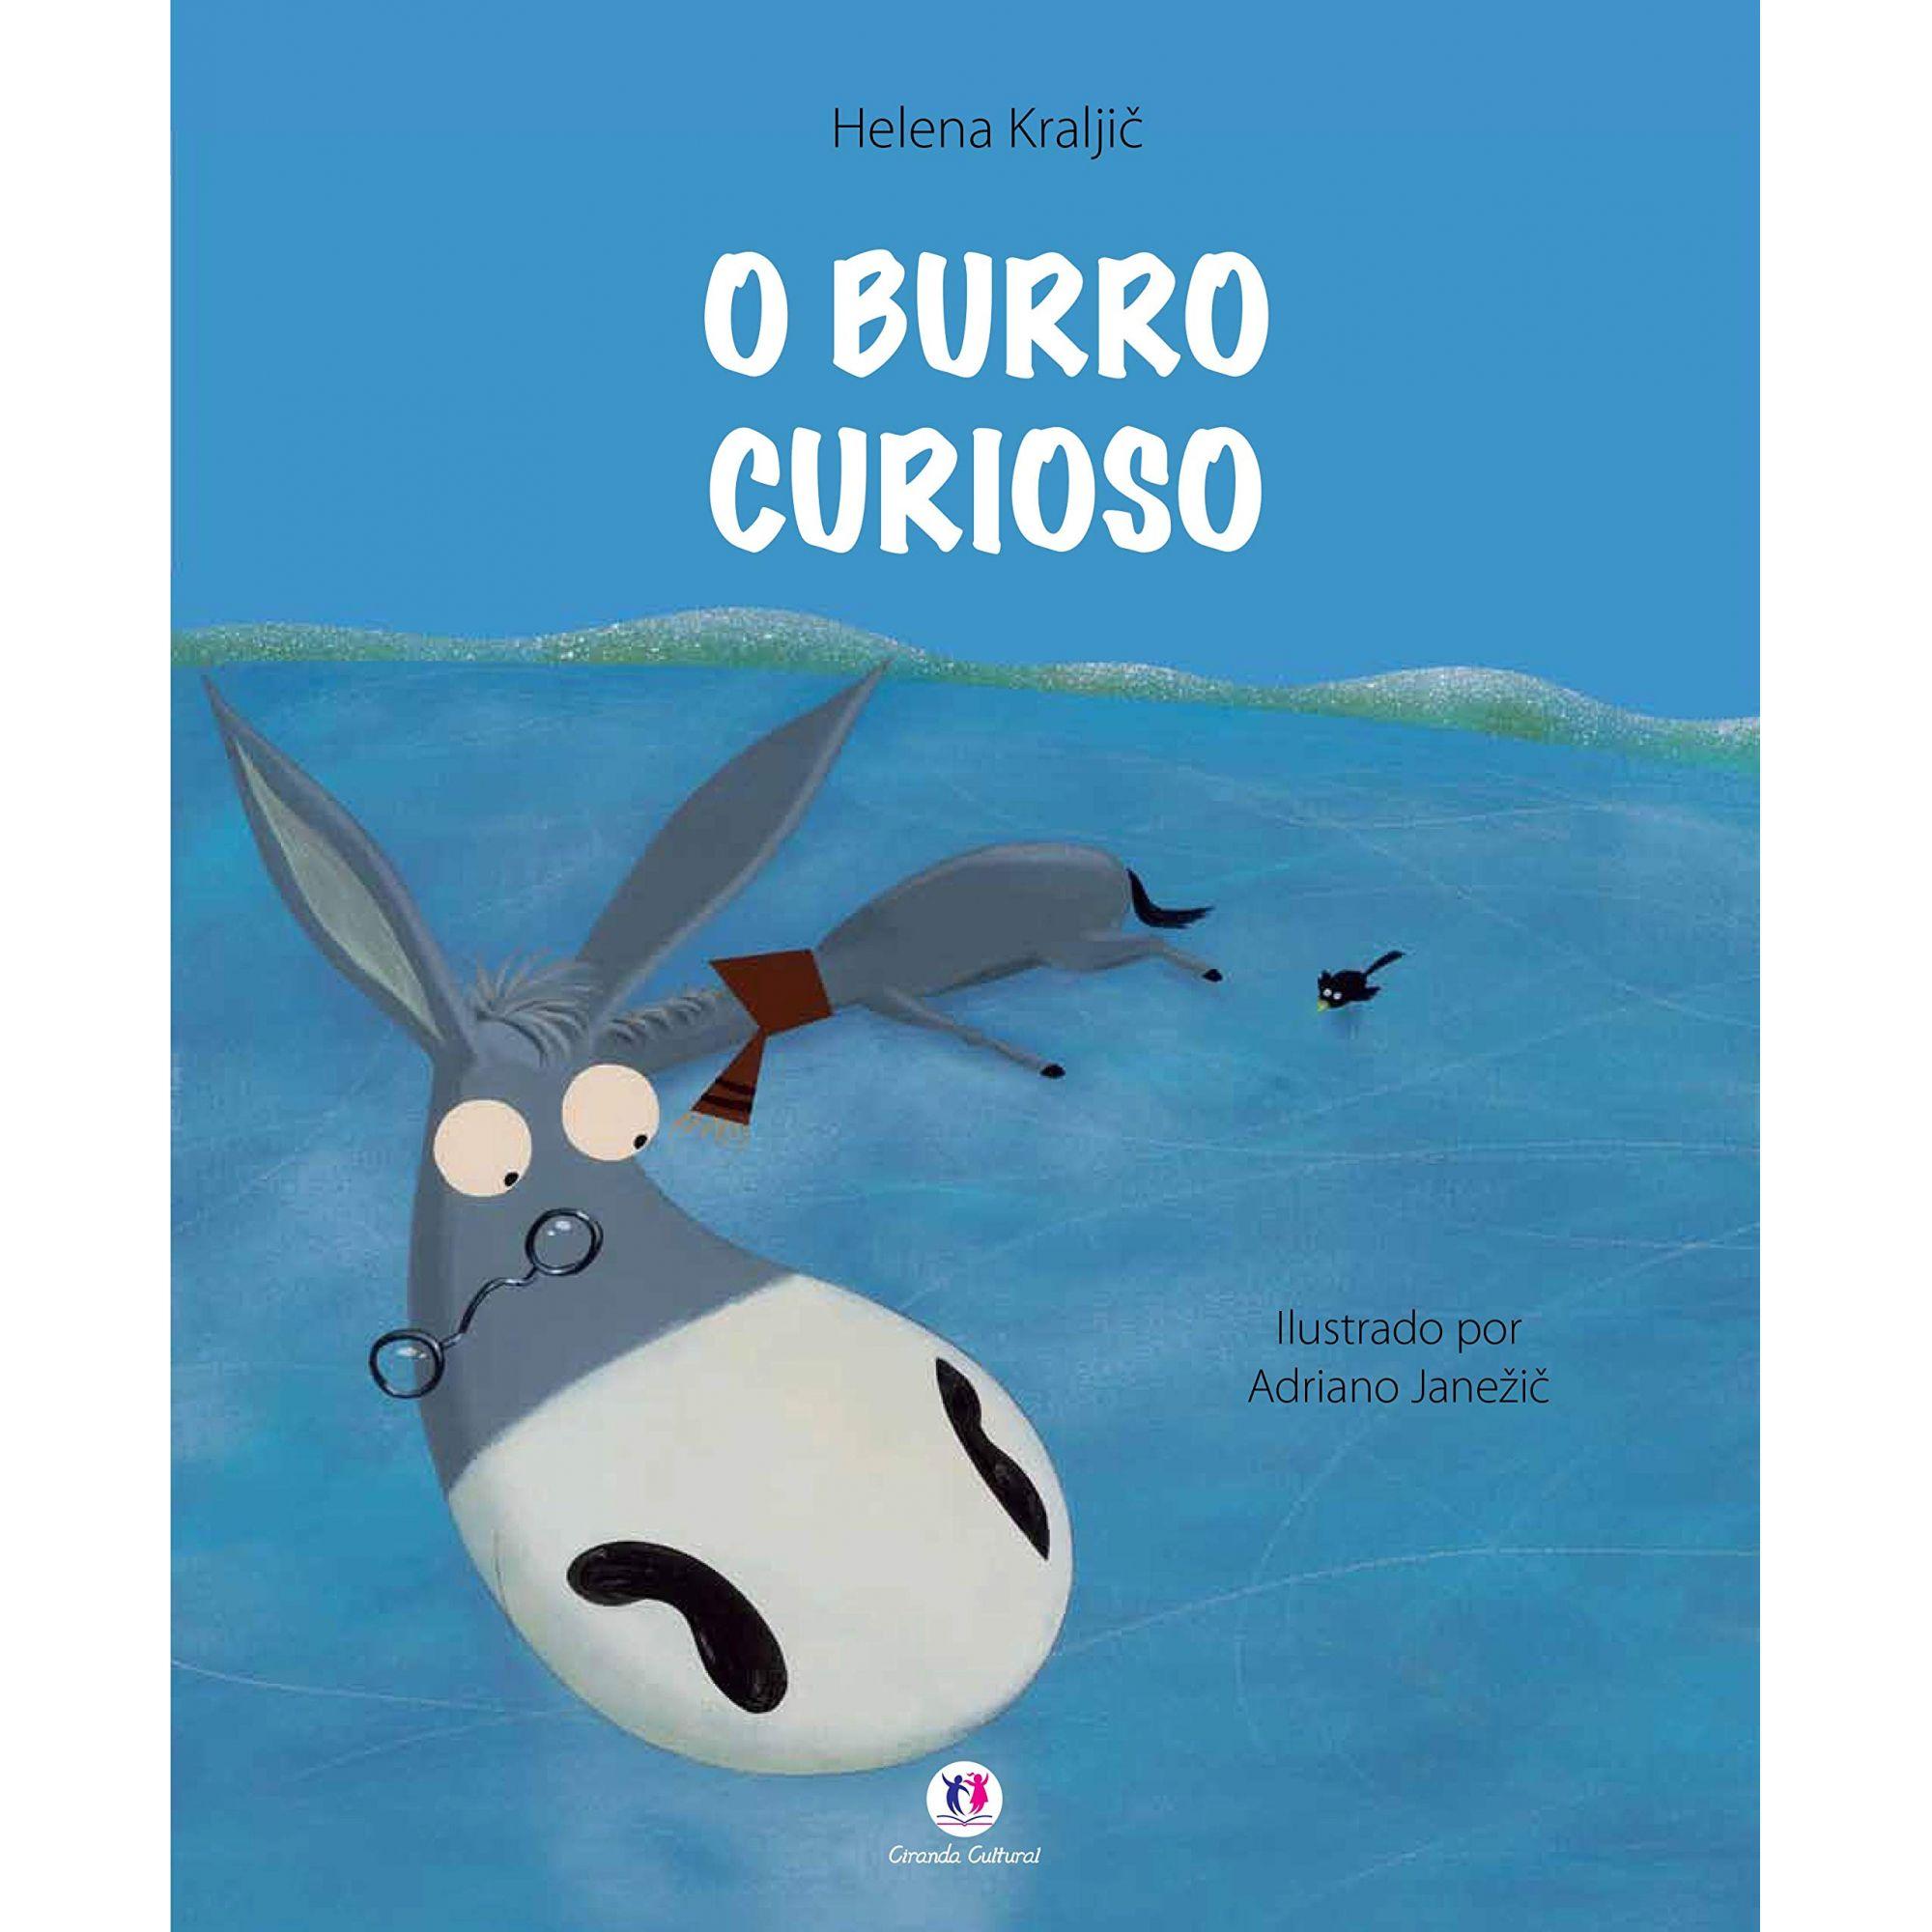 O BURRO CURIOSO